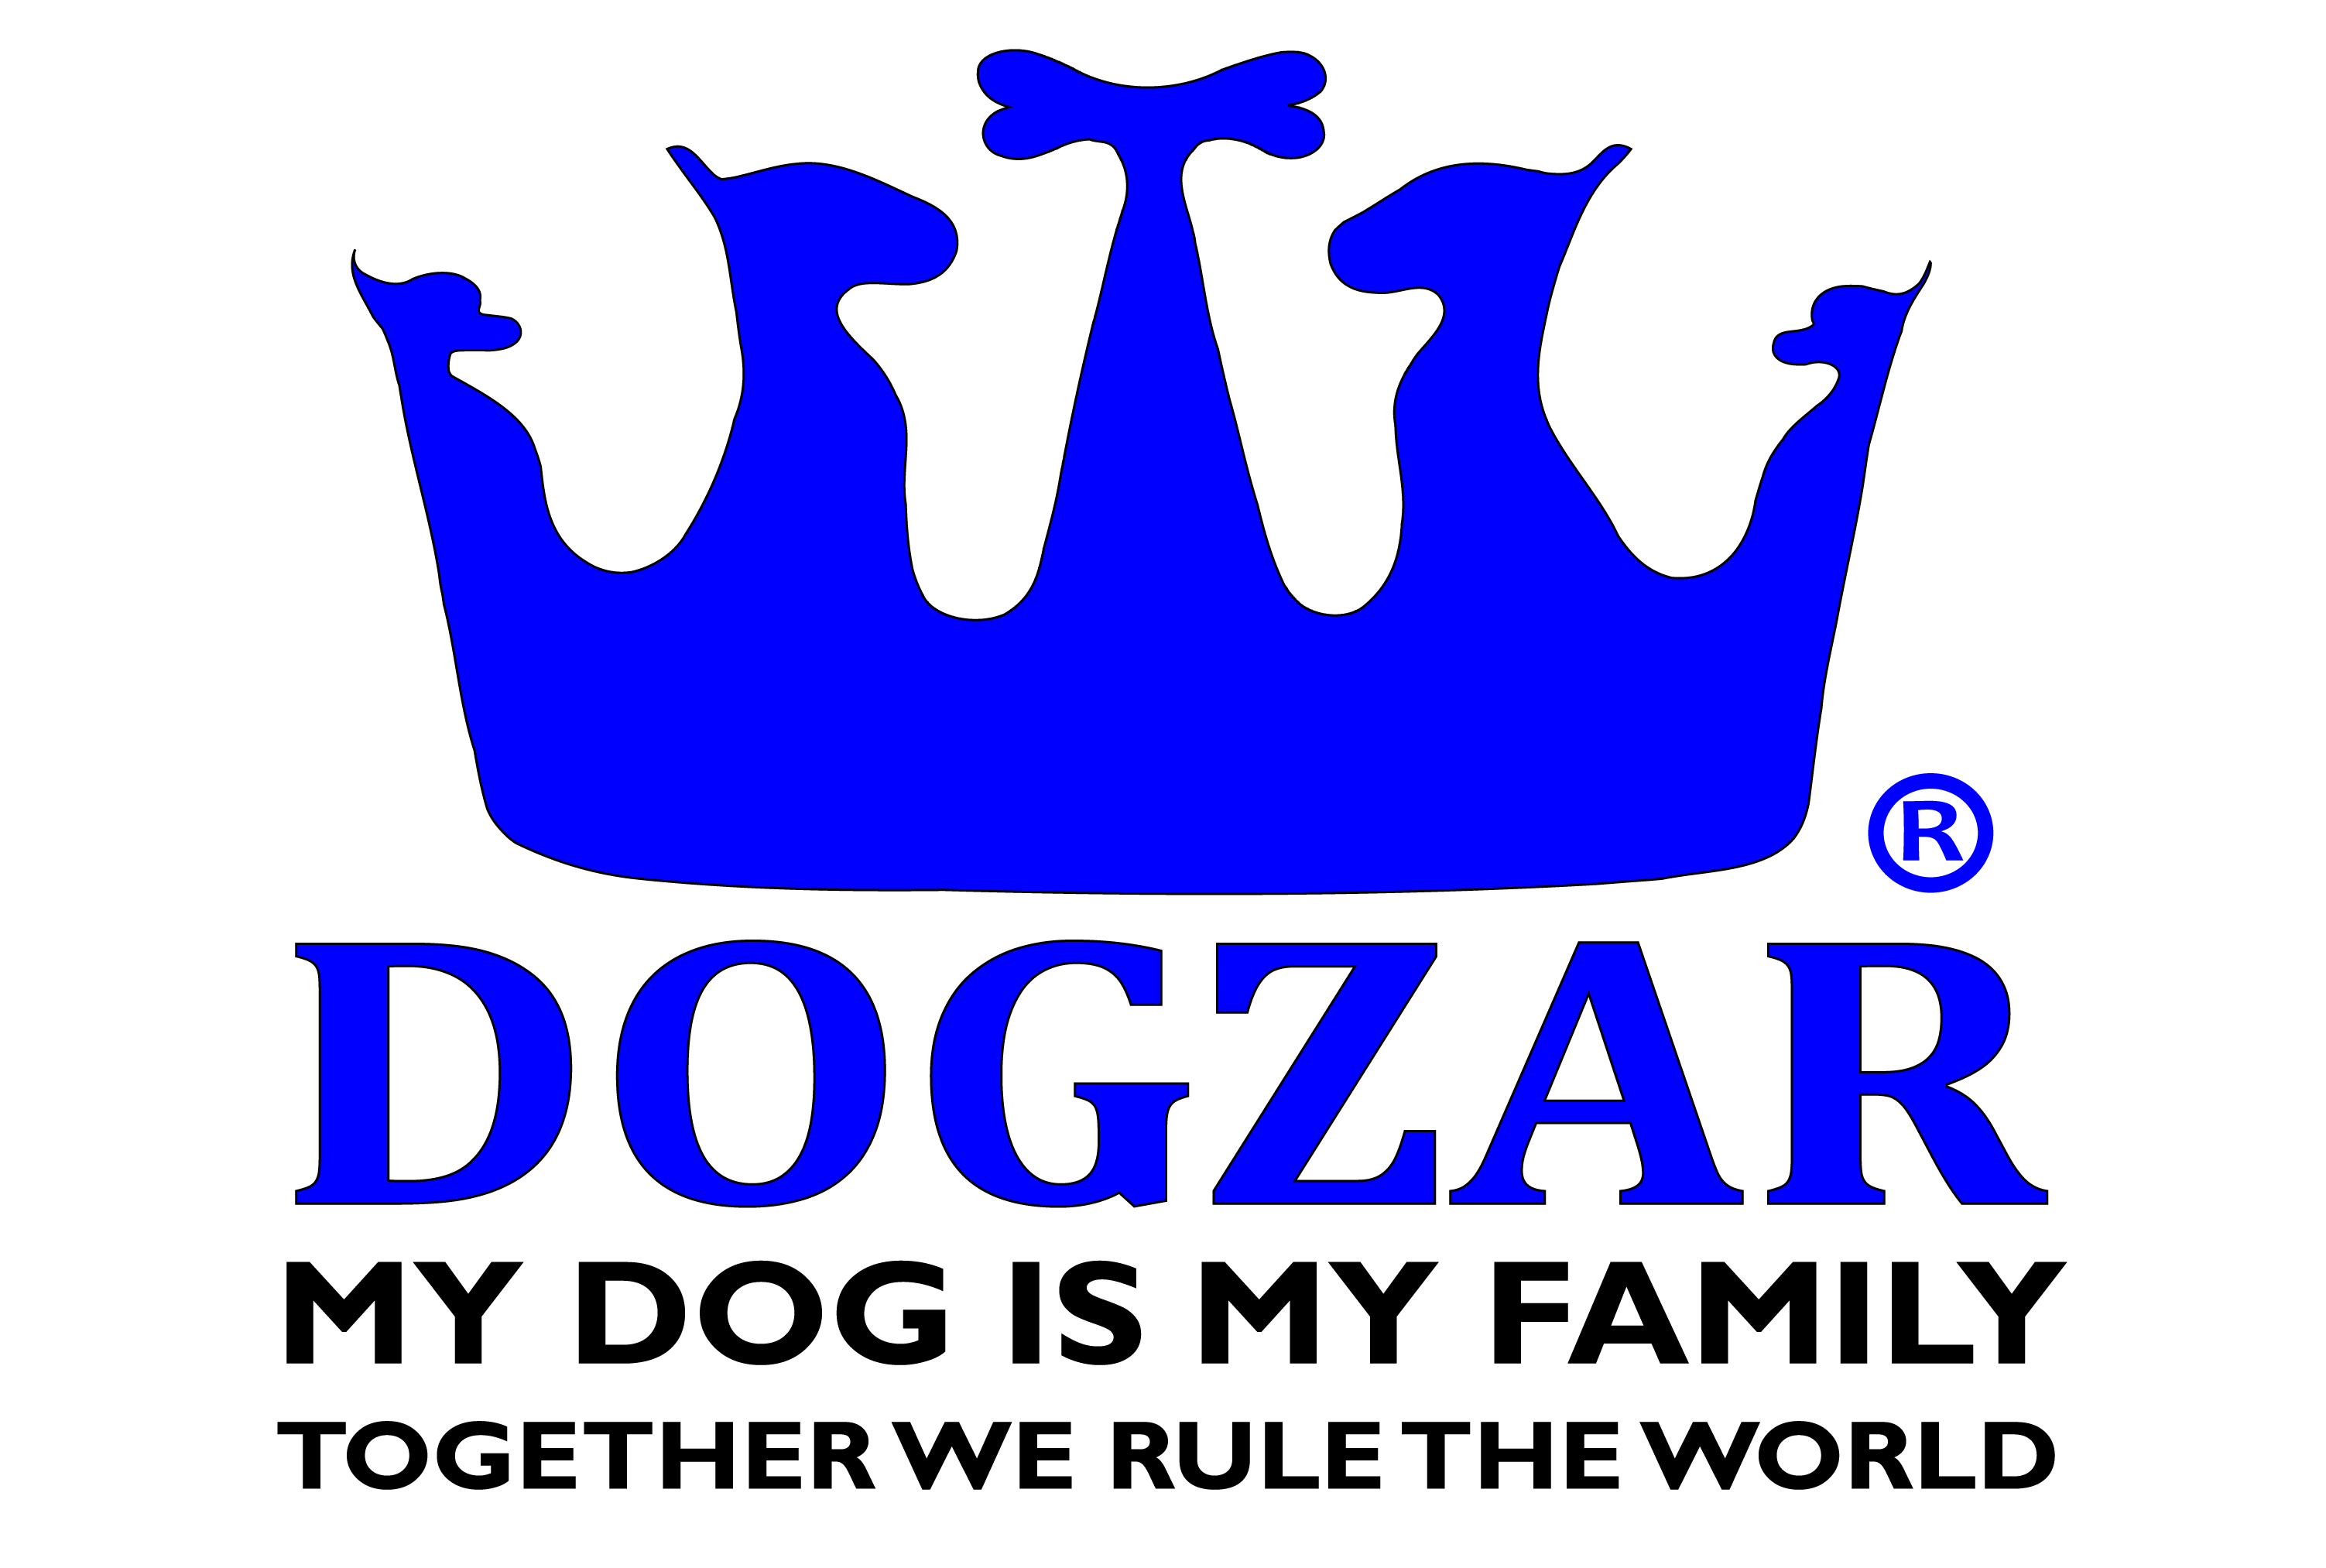 DOGZAR® My DOG is My Family!